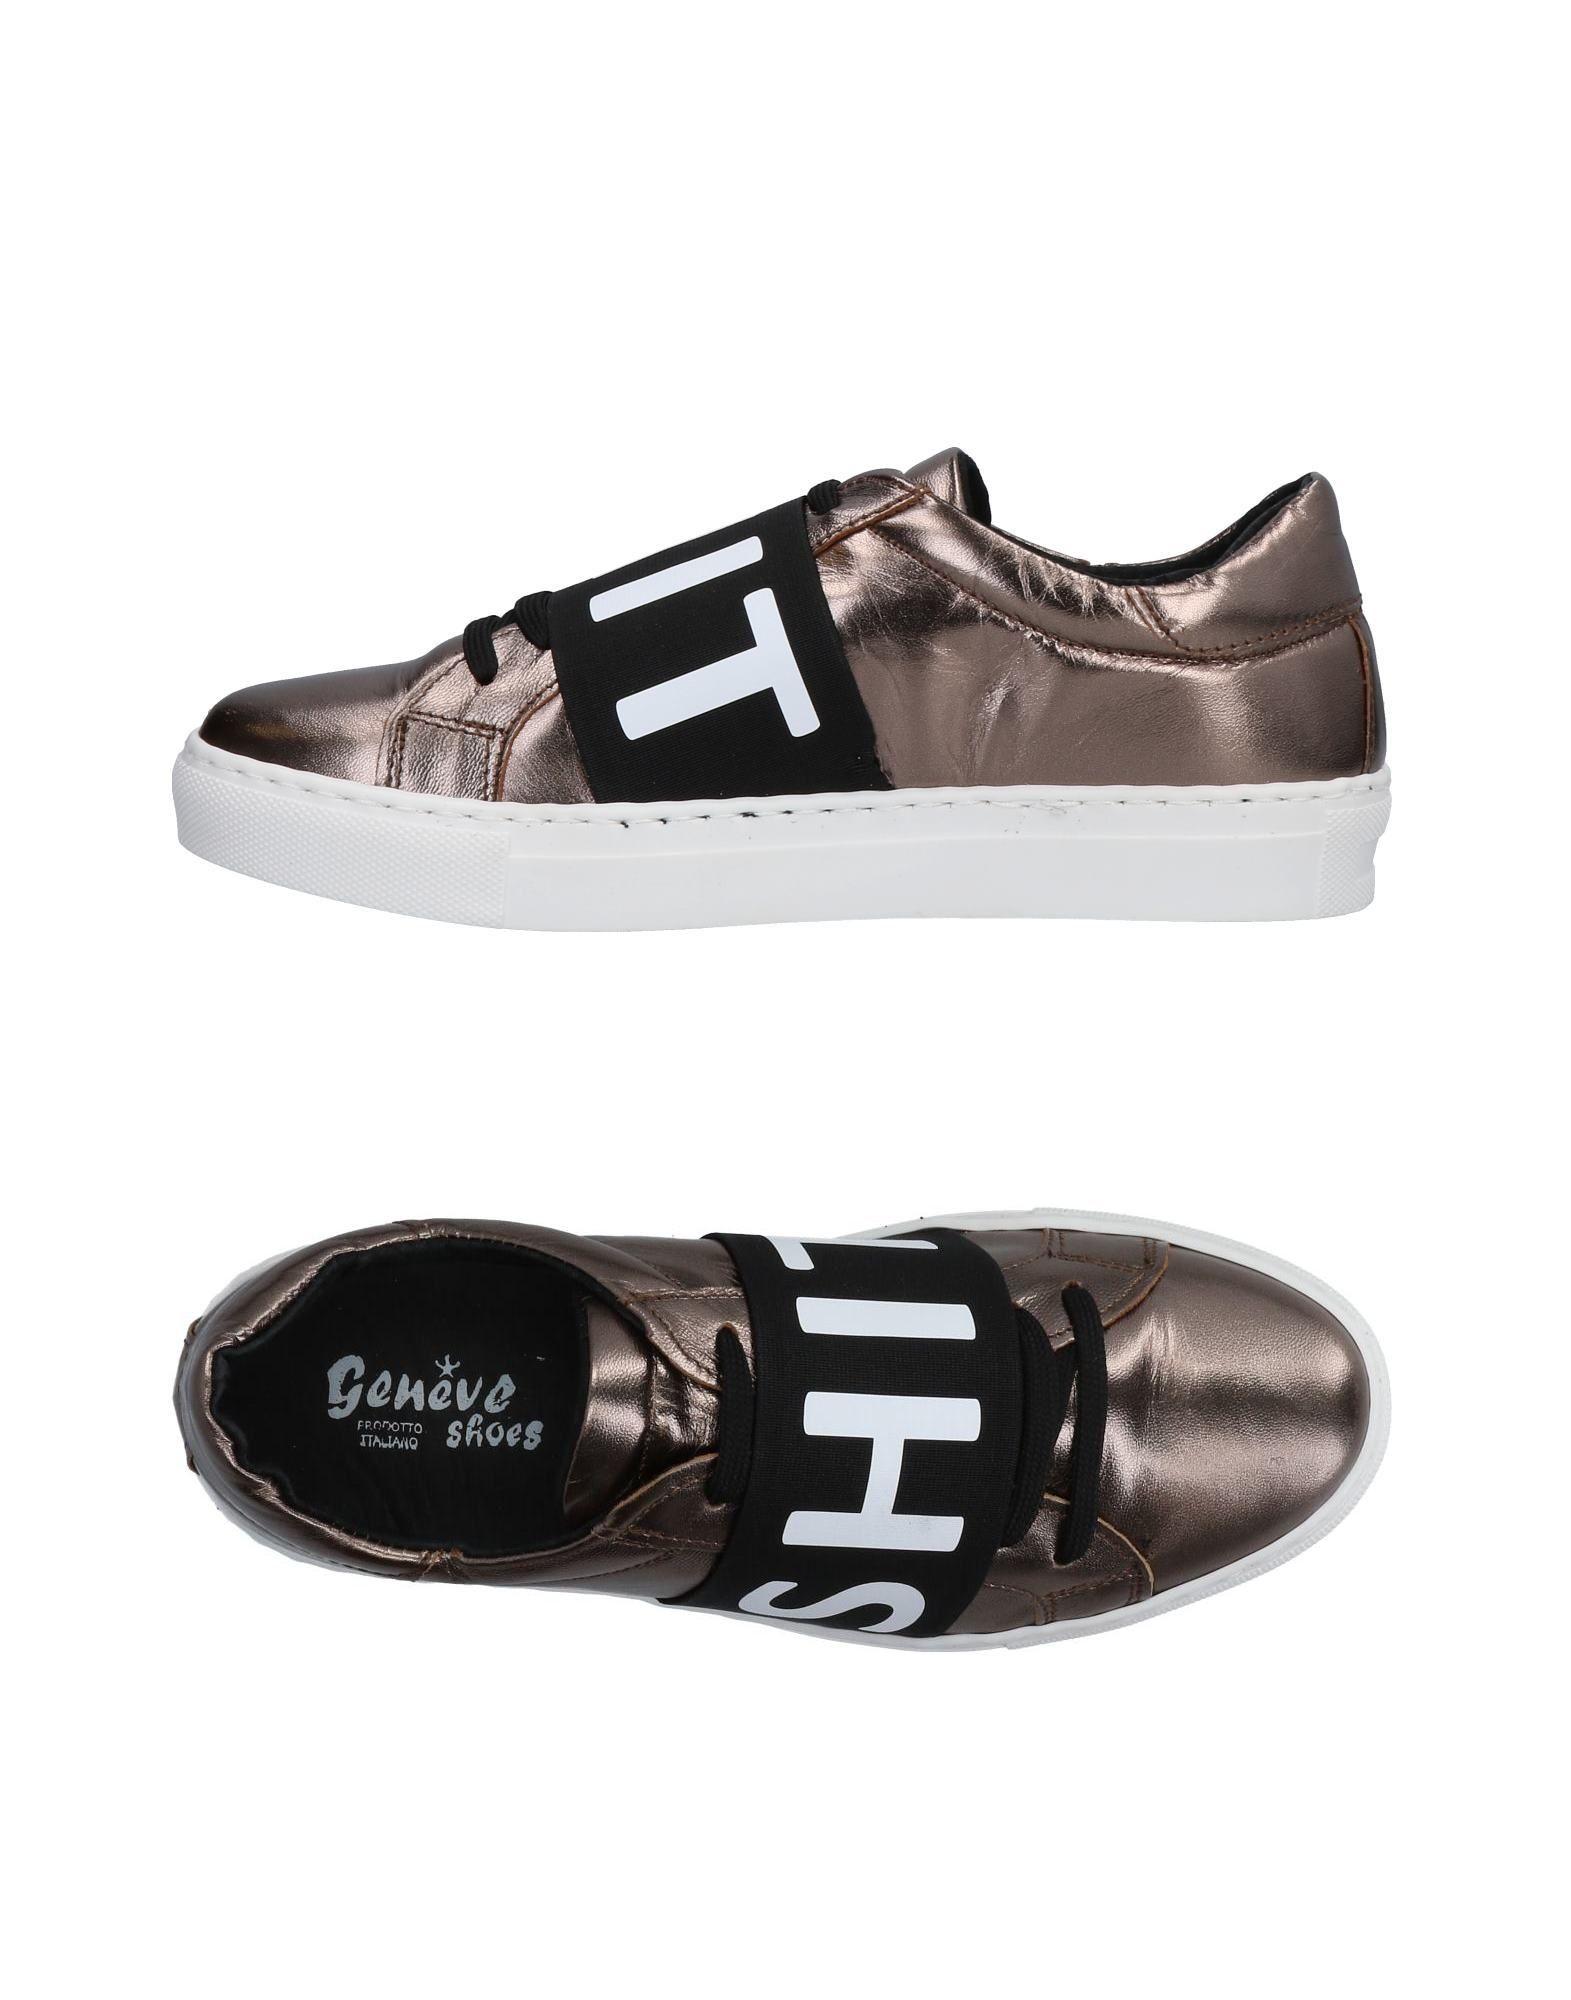 Haltbare Mode billige Schuhe Geneve Sneakers Damen  11470248NG Heiße Schuhe